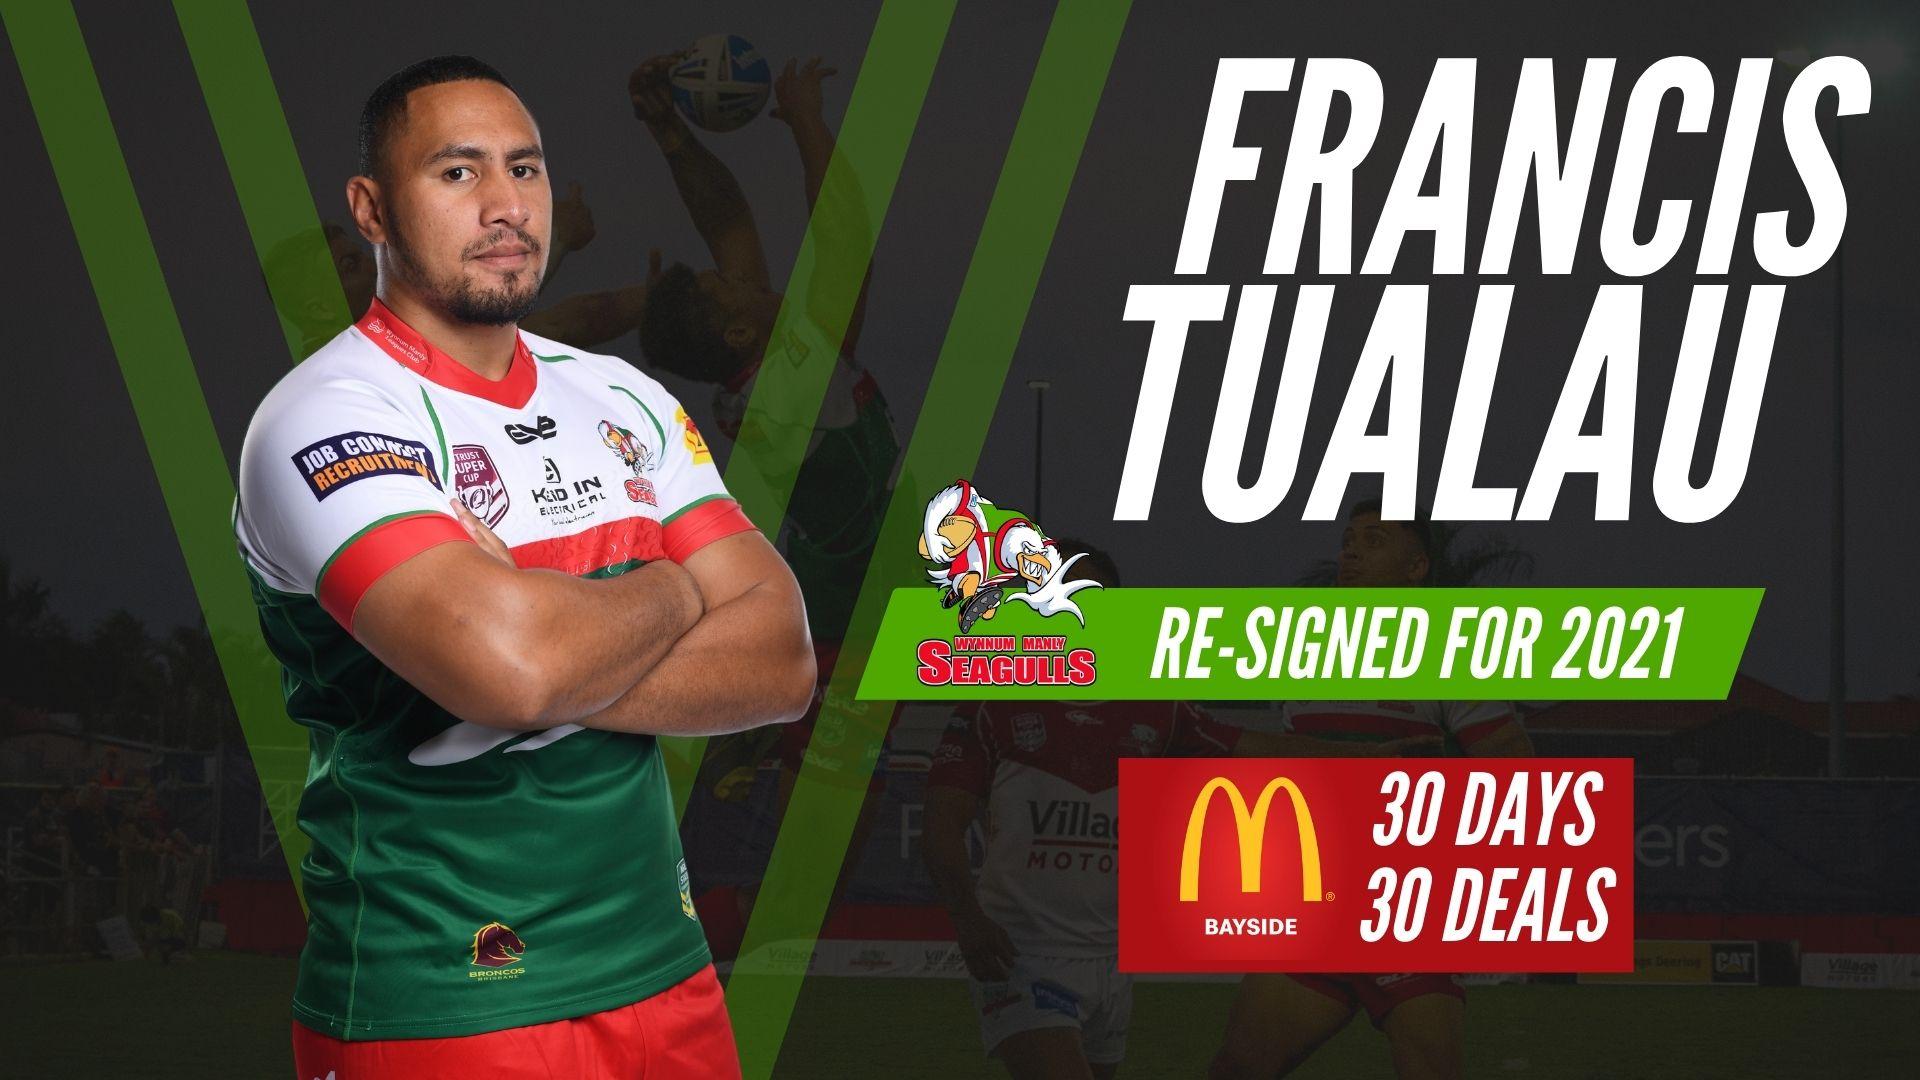 Francis Tualau returns for 2021